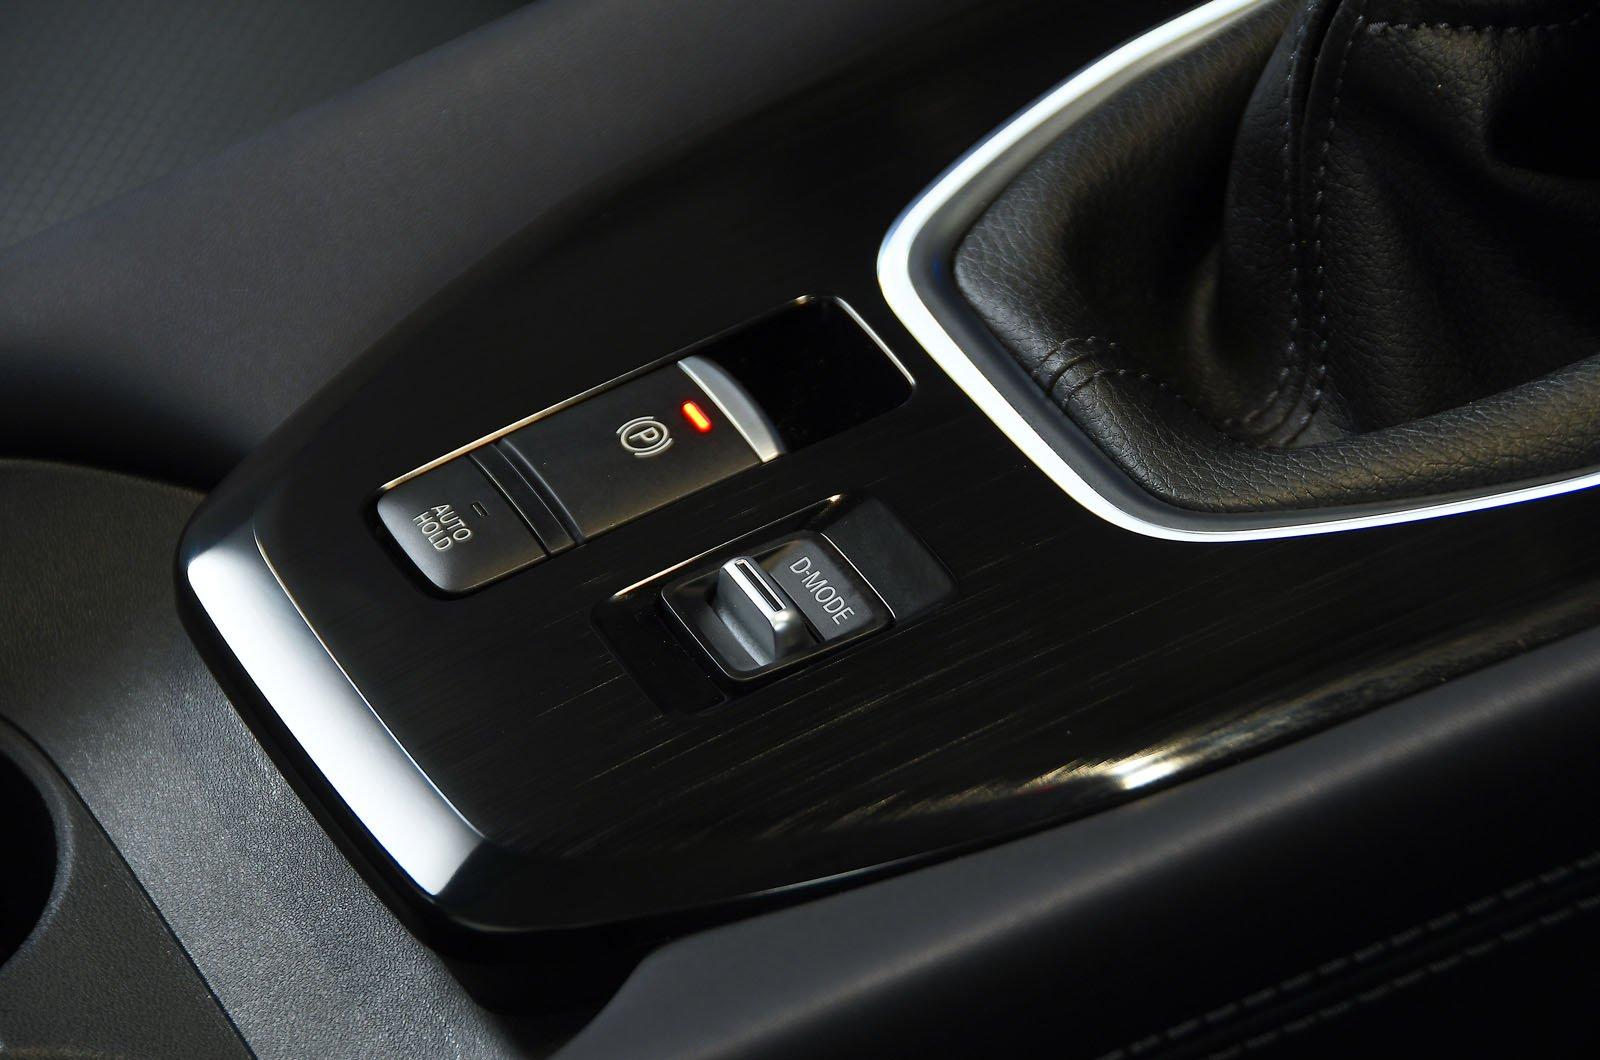 Nissan Qashqai 2021 drive mode switch